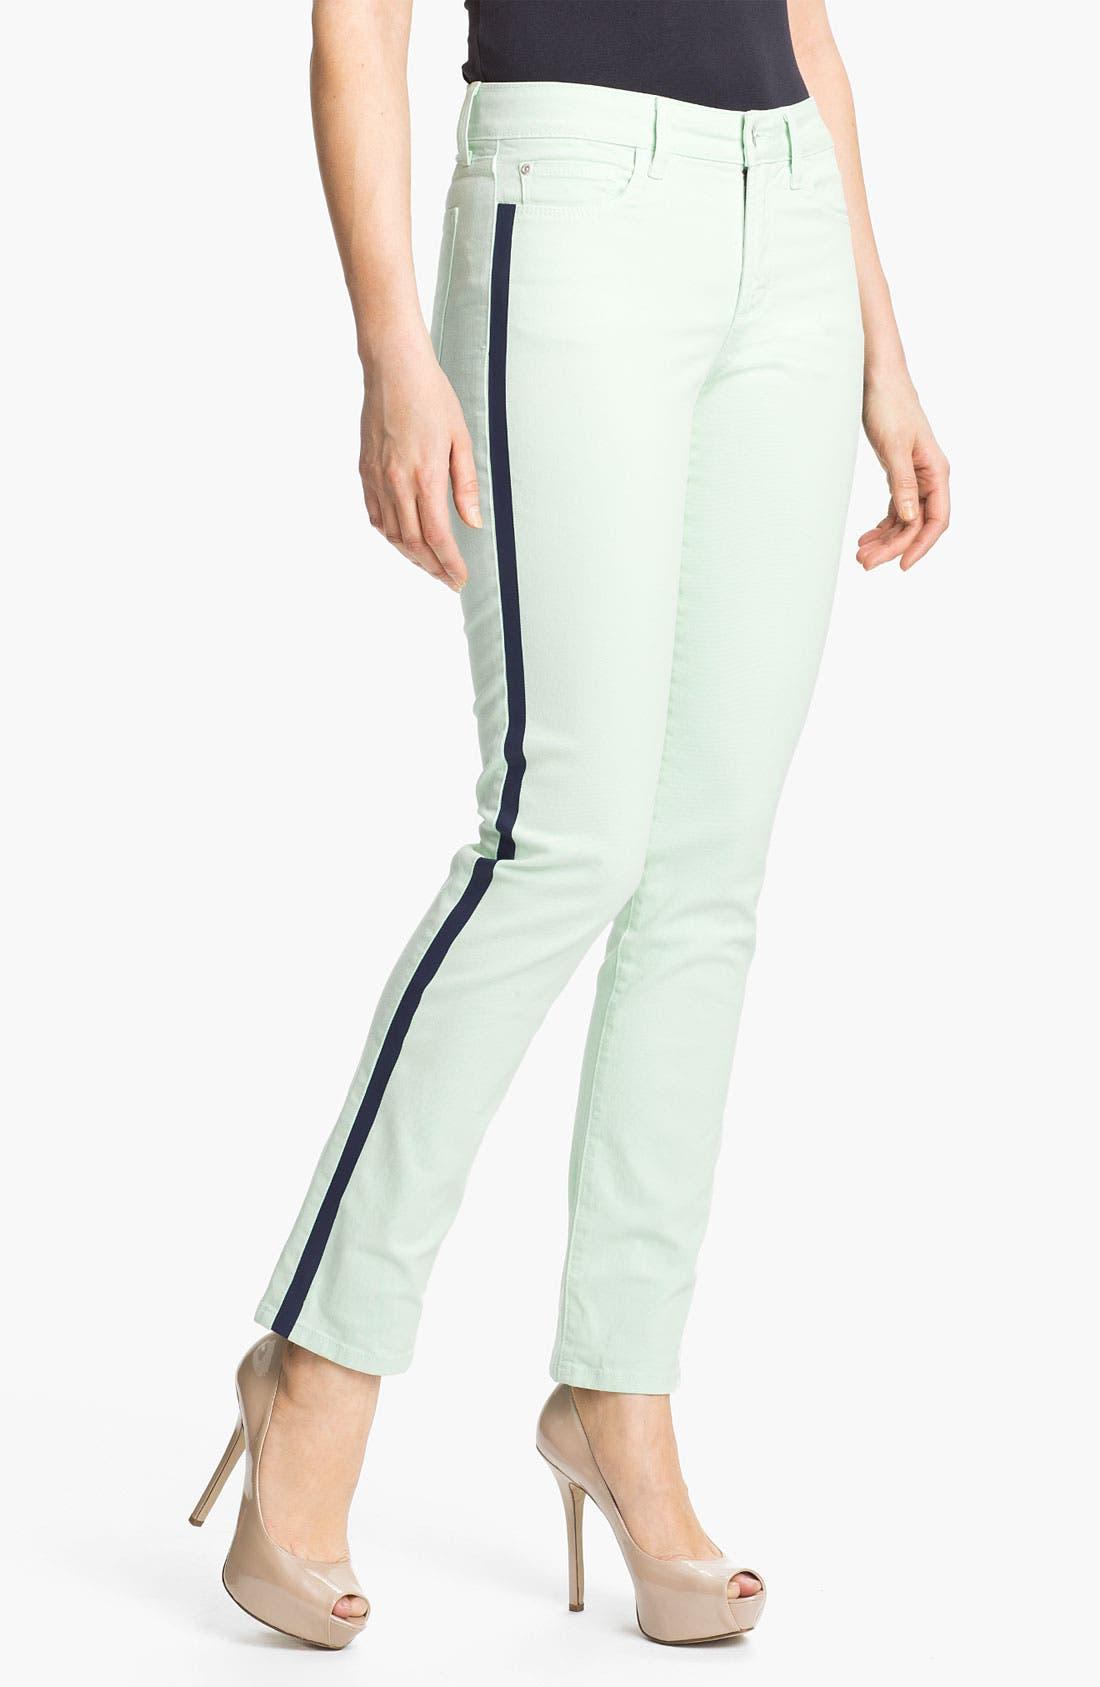 Alternate Image 1 Selected - NYDJ 'Sheri - Tuxedo' Skinny Stretch Jeans